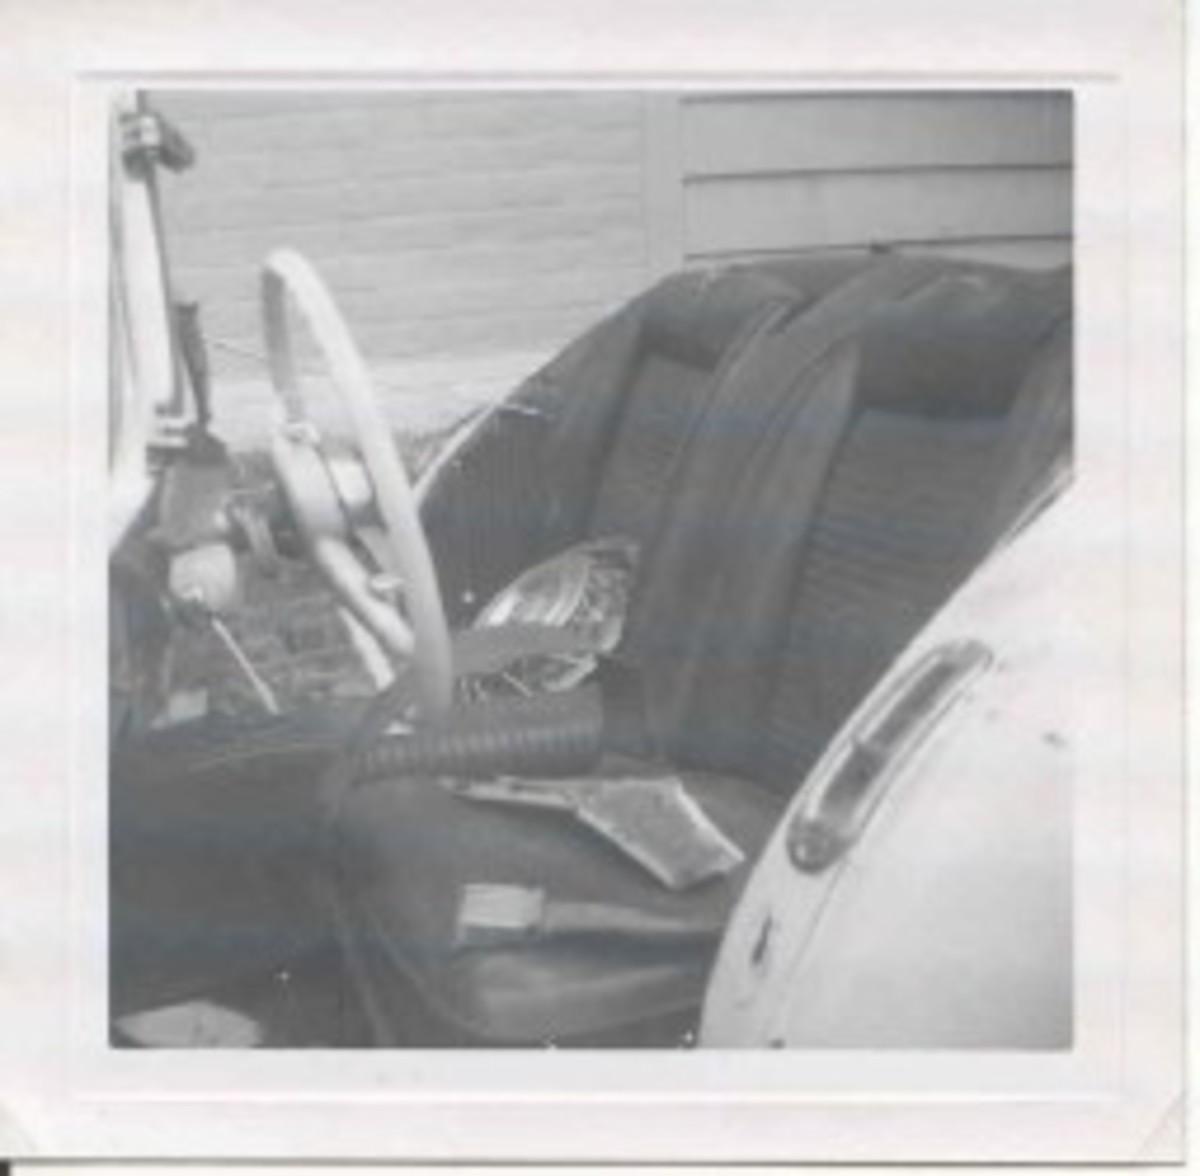 Red & White Darrin 1963 wreck, pic 7.jpg